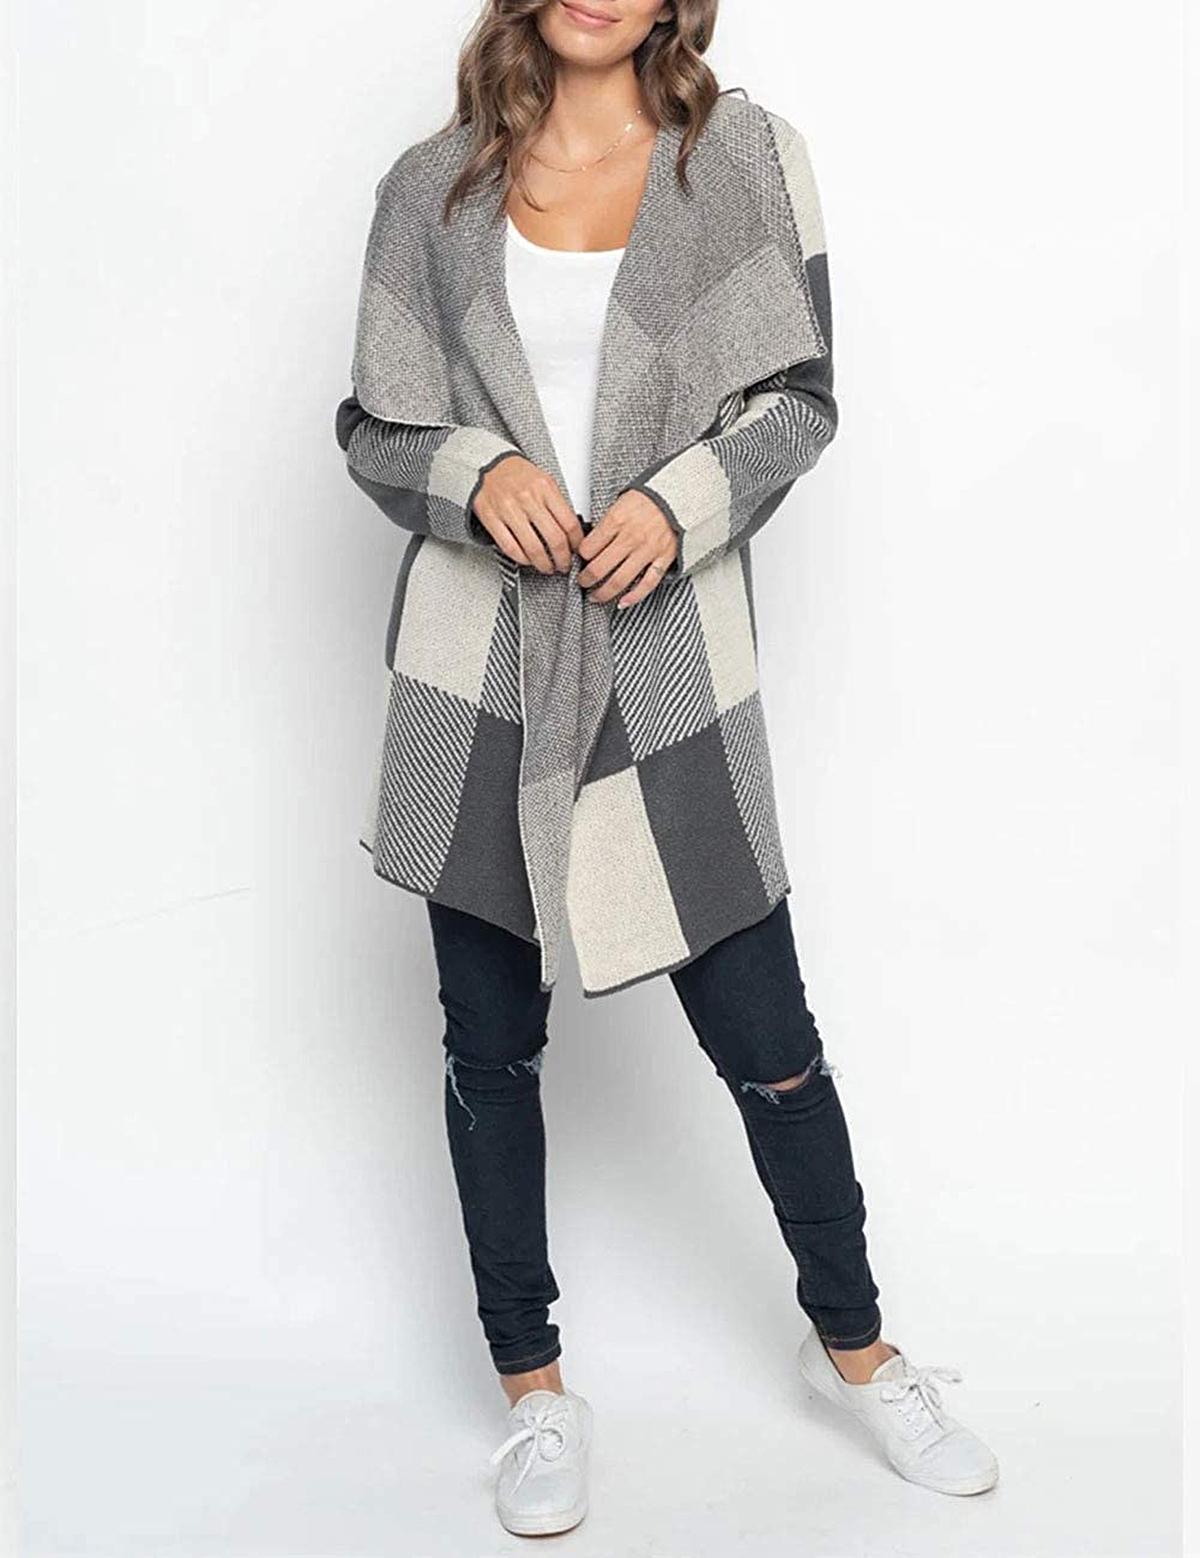 MEROKEETY Plaid Long Sleeve Drape Knit Cardigan